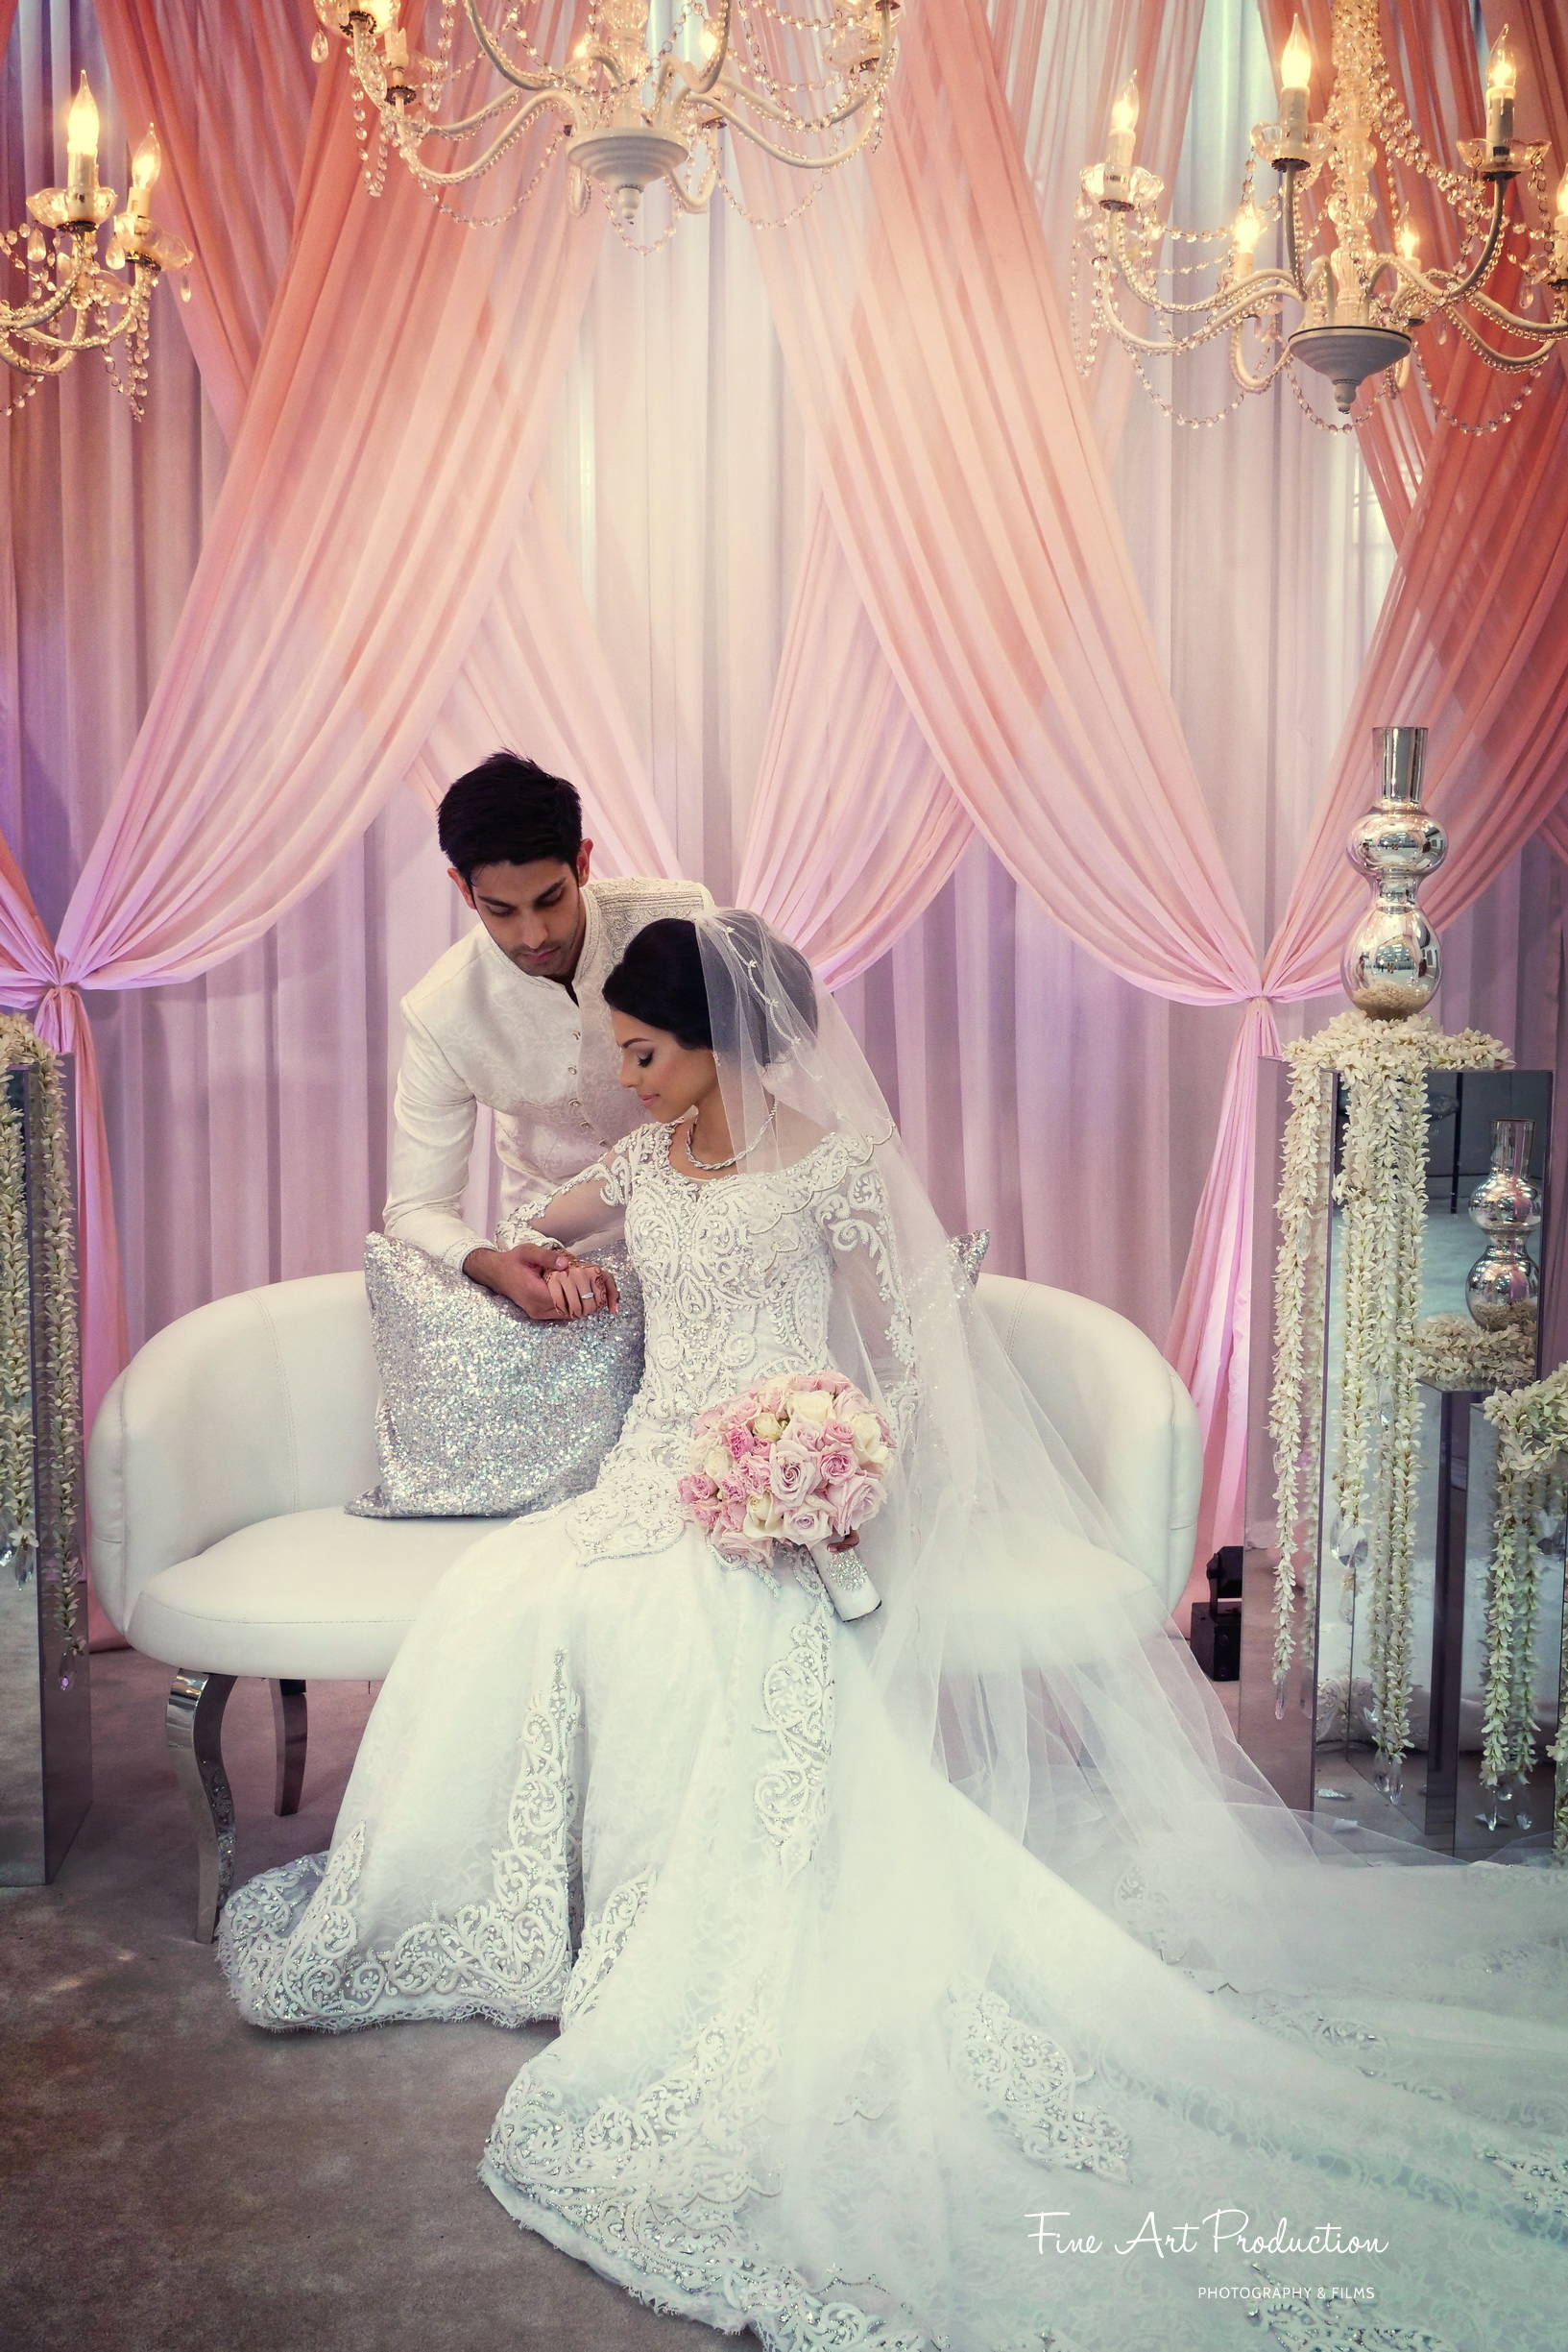 india-wedding-photographer-fine-art-production-chirali-amish-thakkar_0117